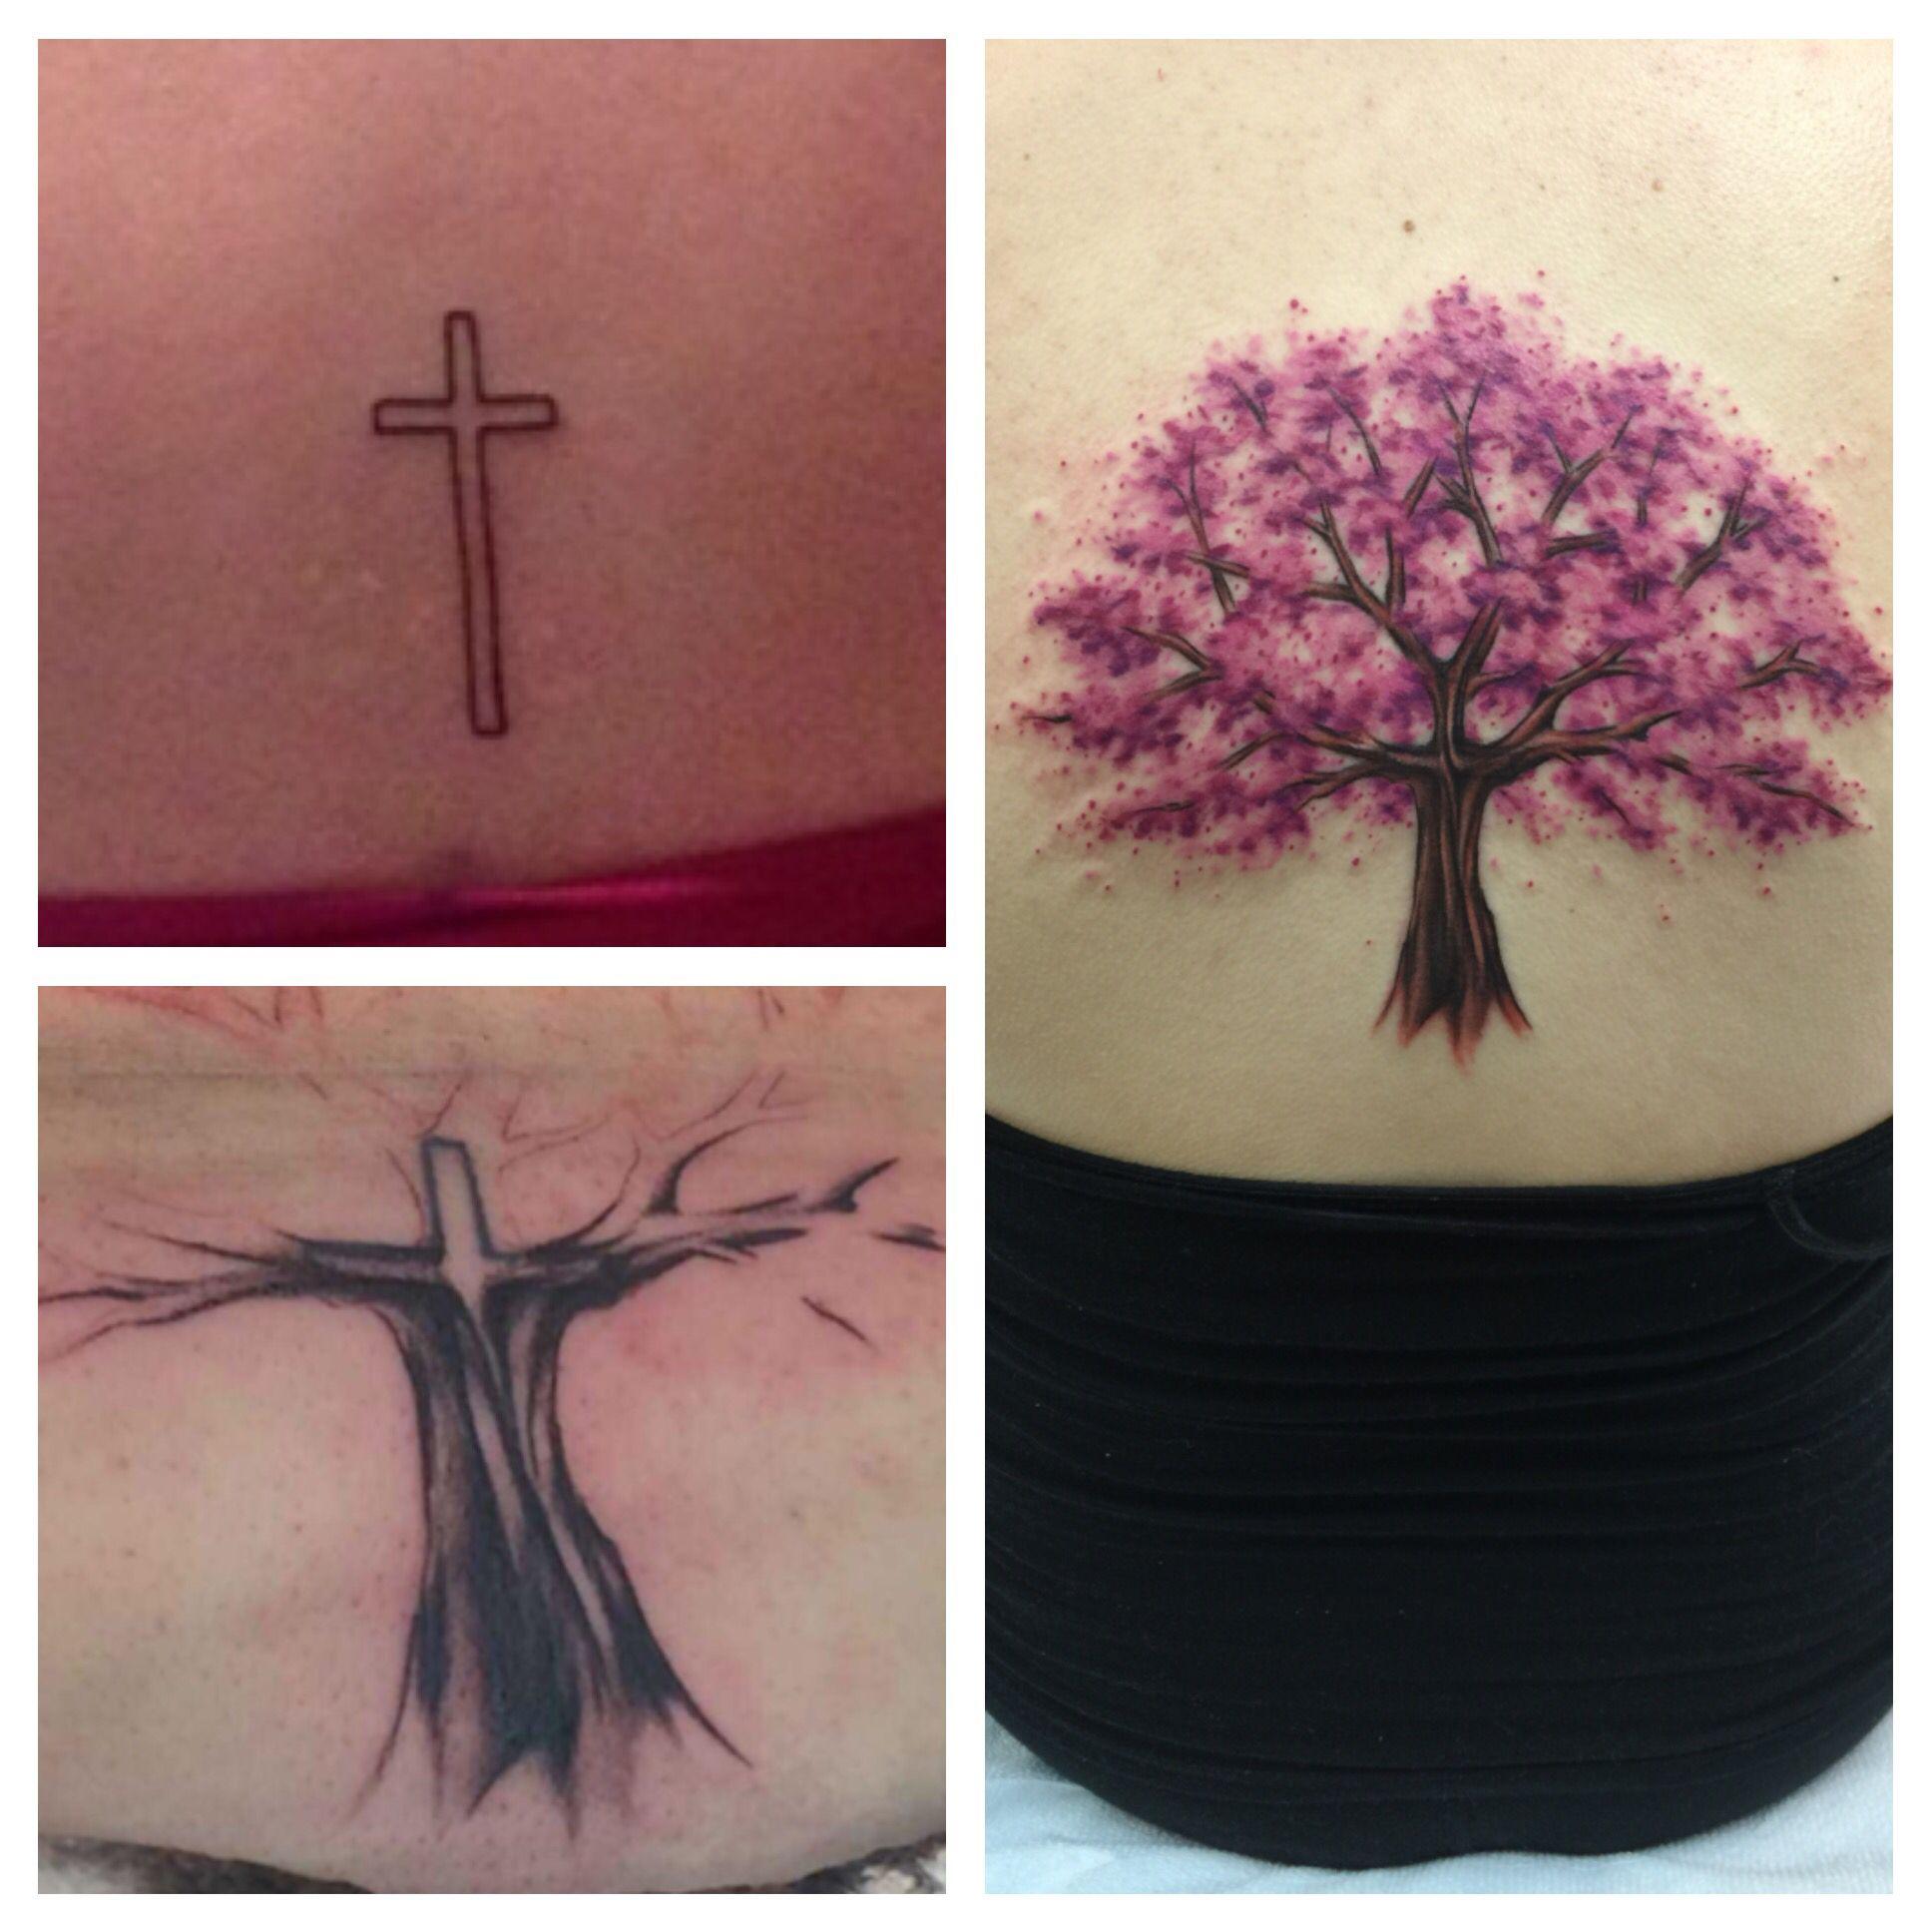 Cross Cover Up Tattoo Into Cherry Blossom Tree Cover Up Tattoo Cover Up Tattoos Up Tattoos